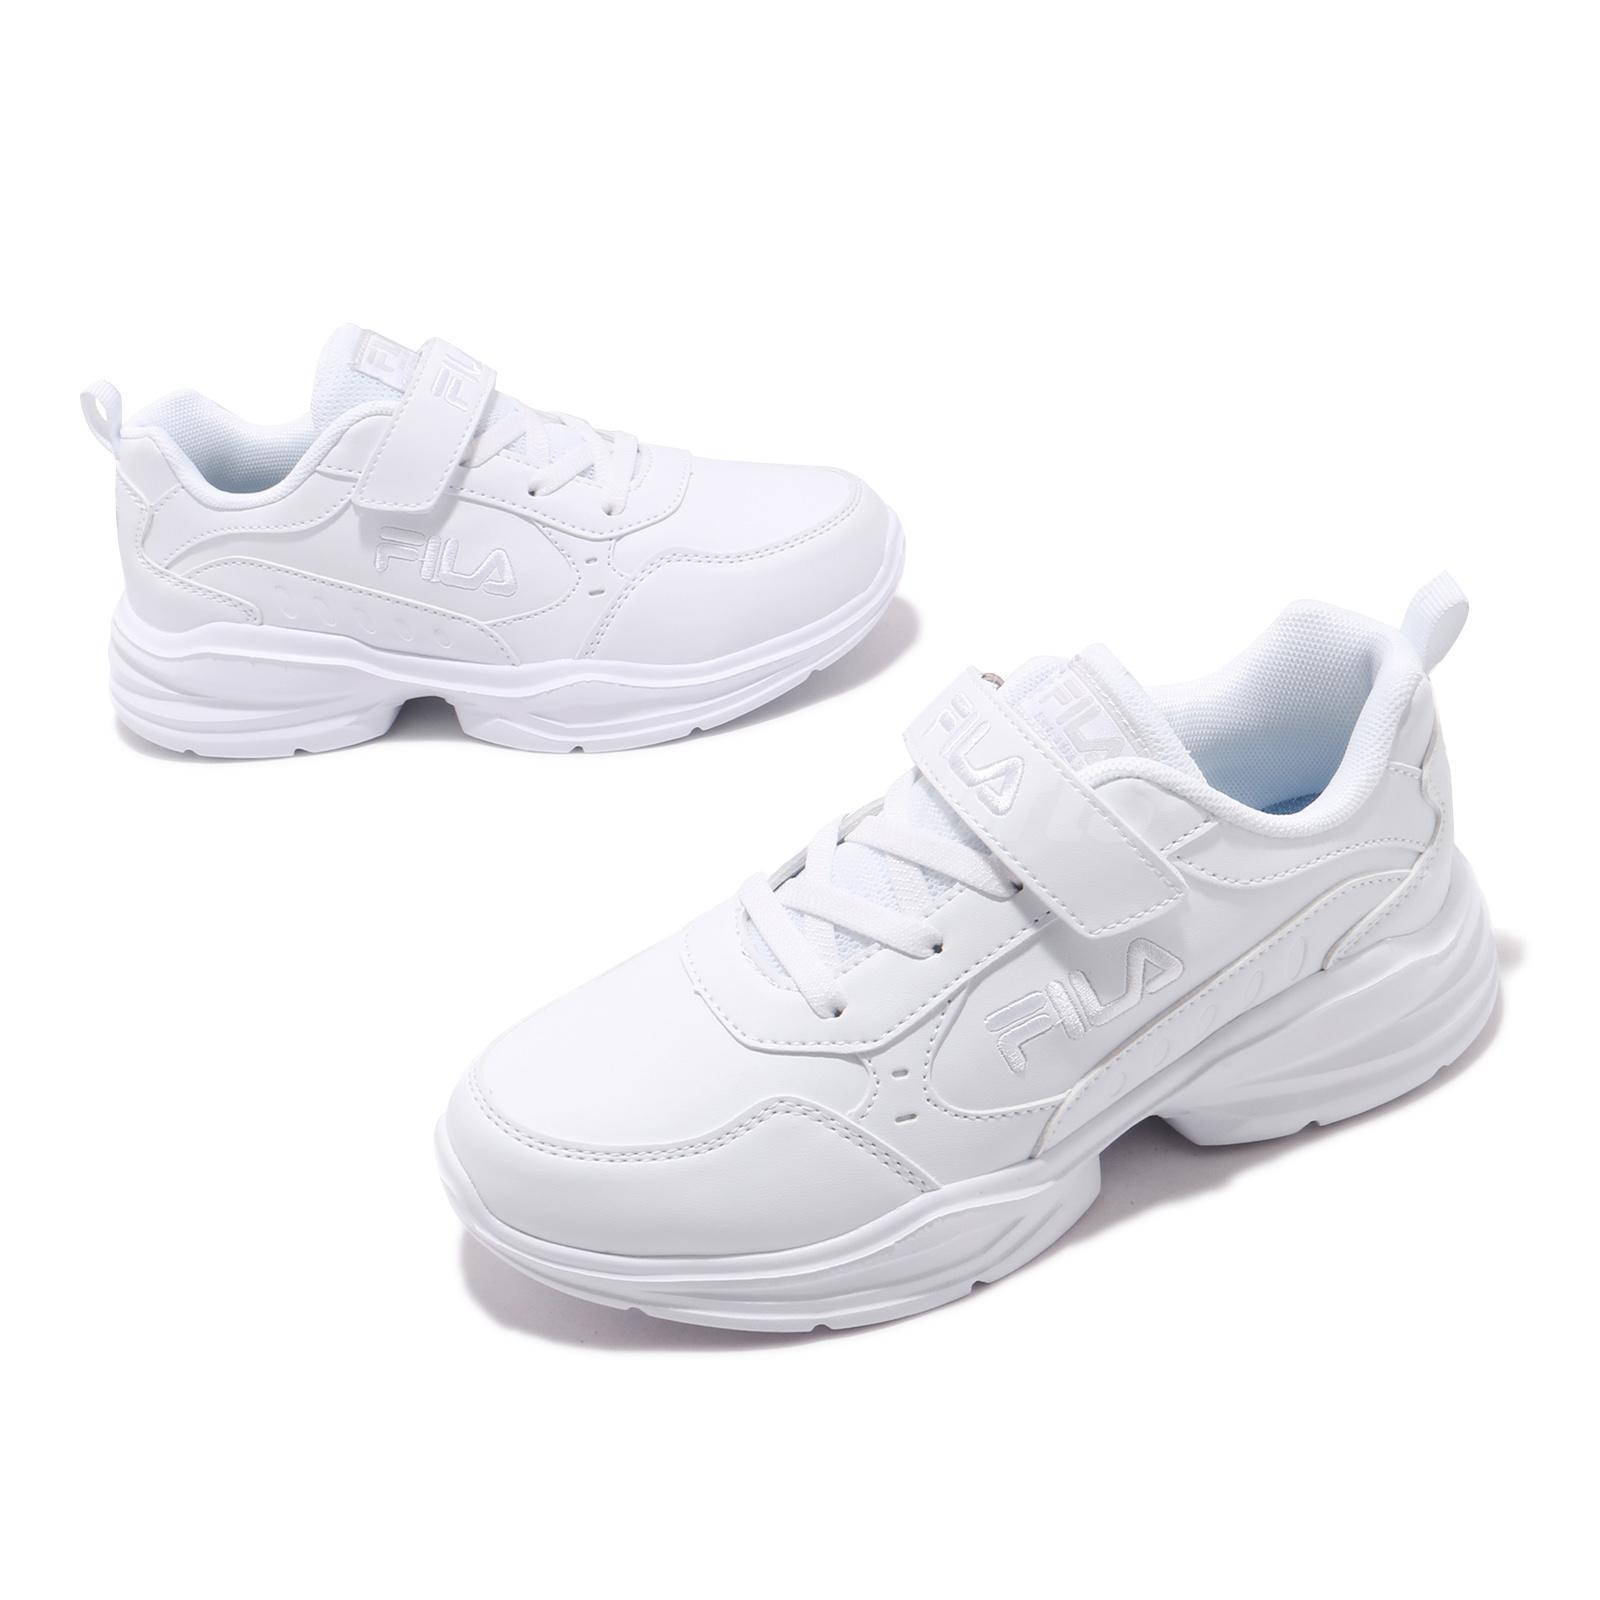 preschool fila Shop Clothing \u0026 Shoes Online